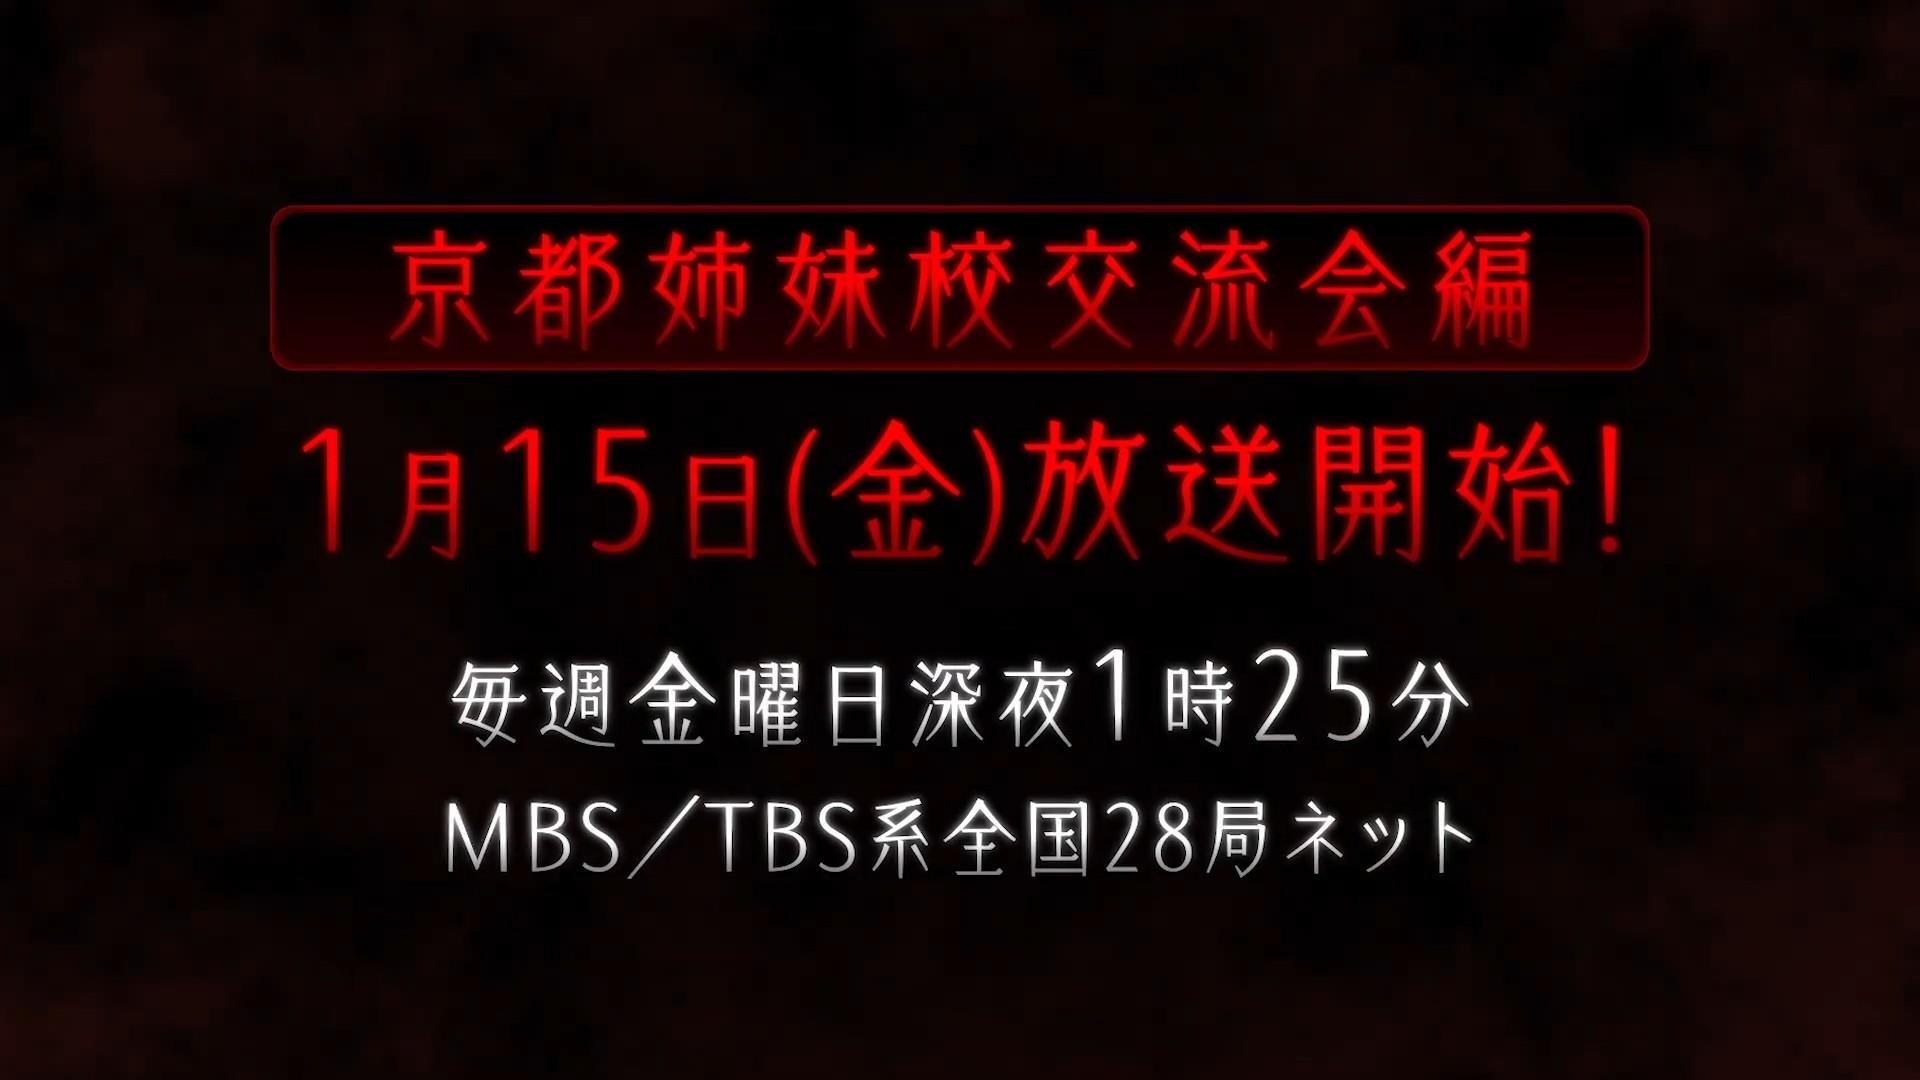 TV动画《咒术回战》第4弹PV公开, 第14话将于1月15日播出-